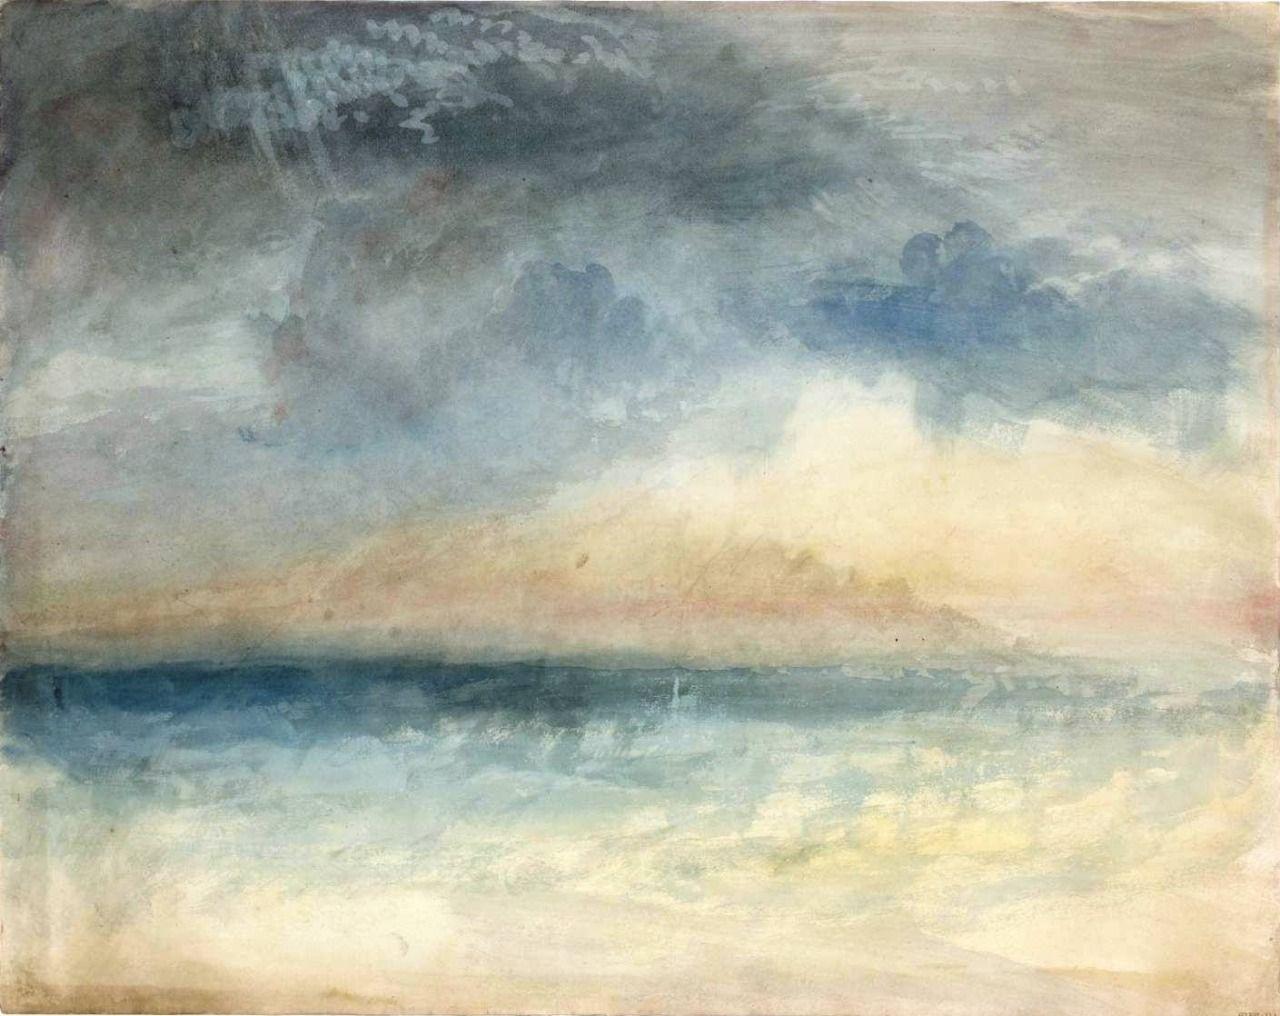 Turner Peintre William Turner Joseph Mallord William Turner